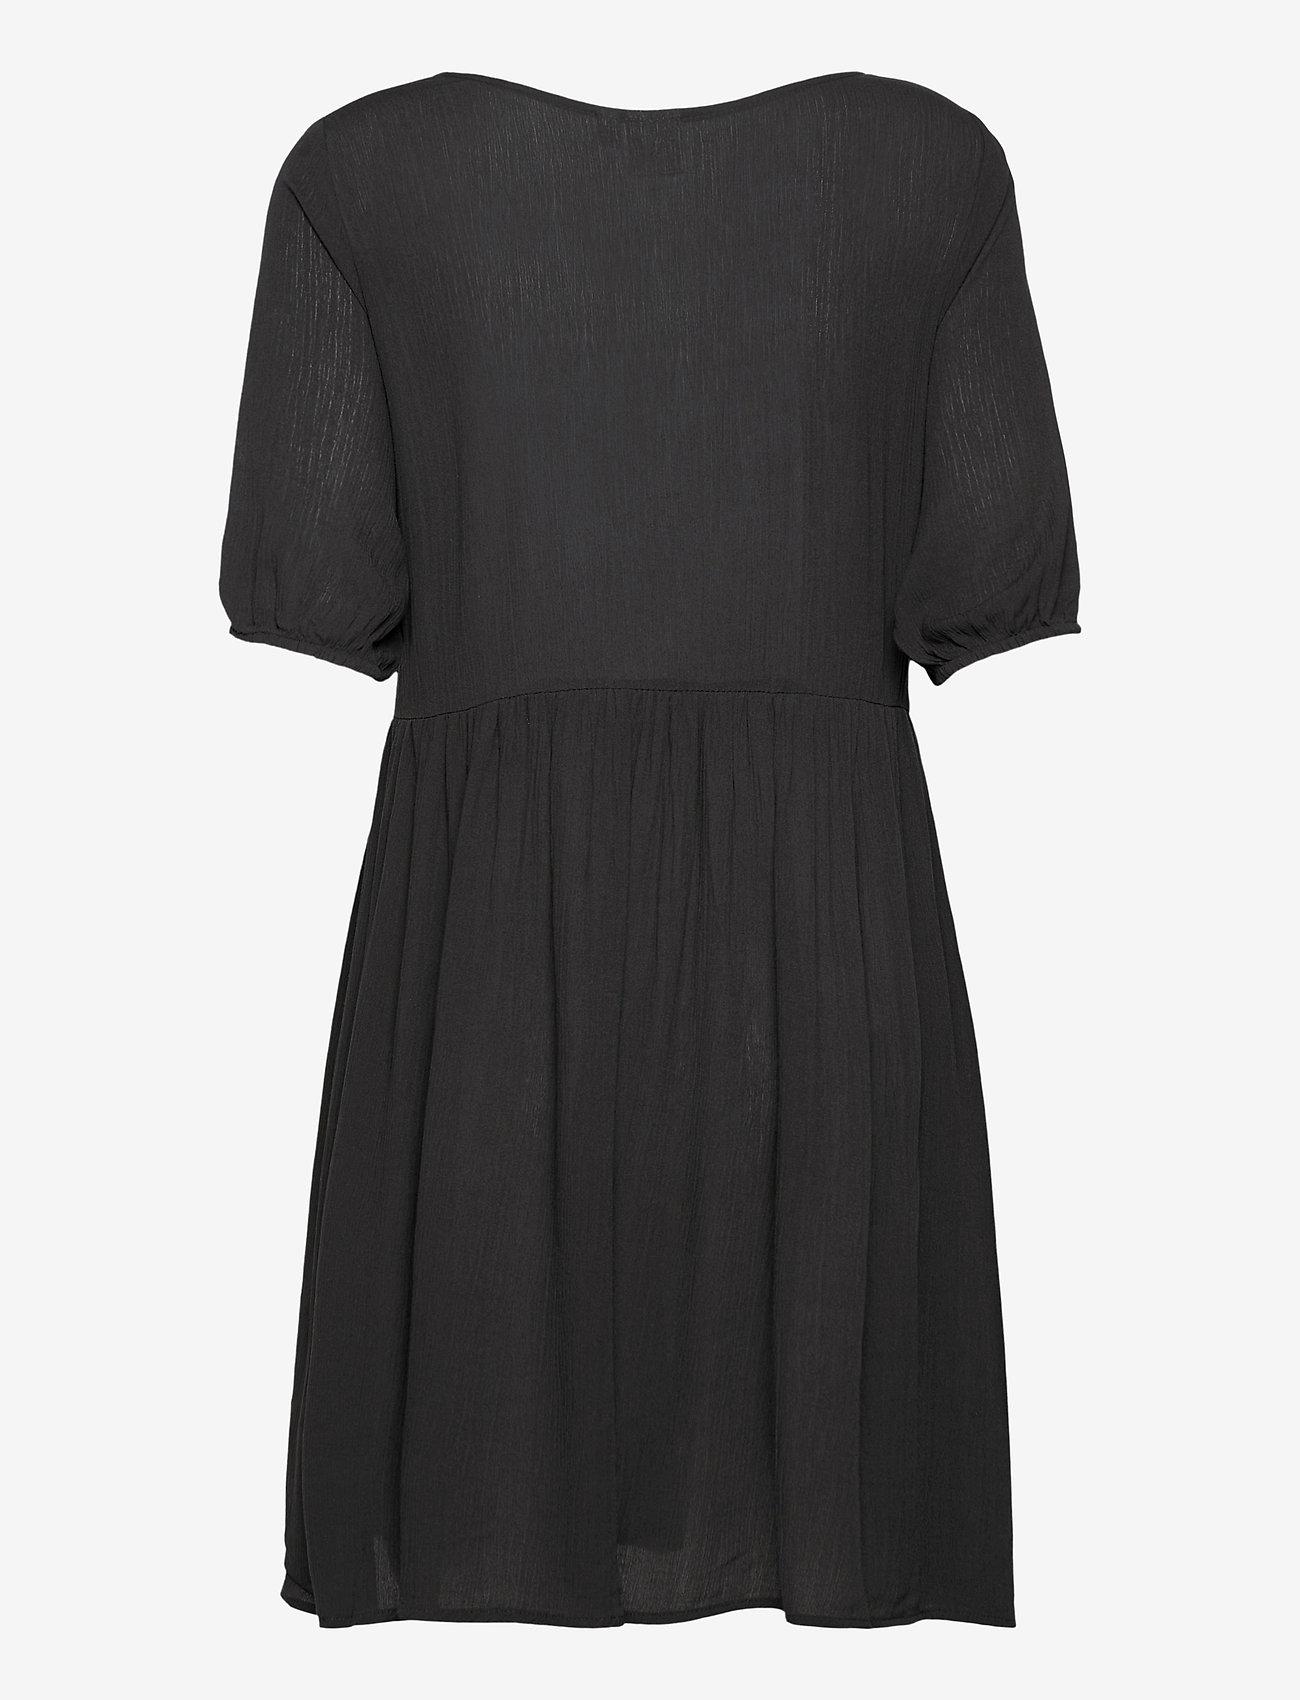 ICHI - IHMARRAKECH SO DR7 - summer dresses - black - 1